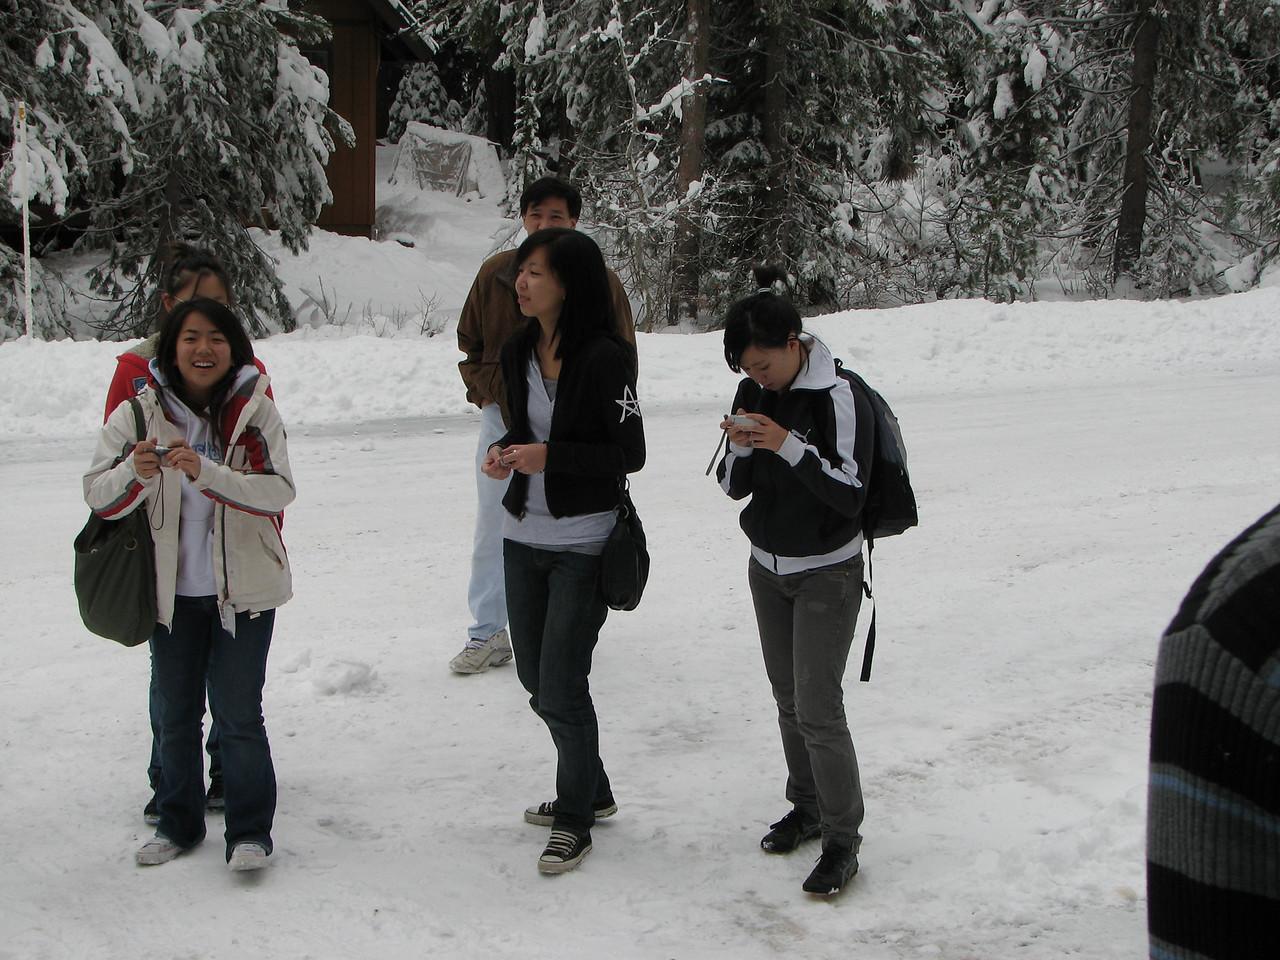 2006 12 23 Sat - Angela Hsu, Shinae Kim, Kai, Liz Lee, & Stacy Lee outside